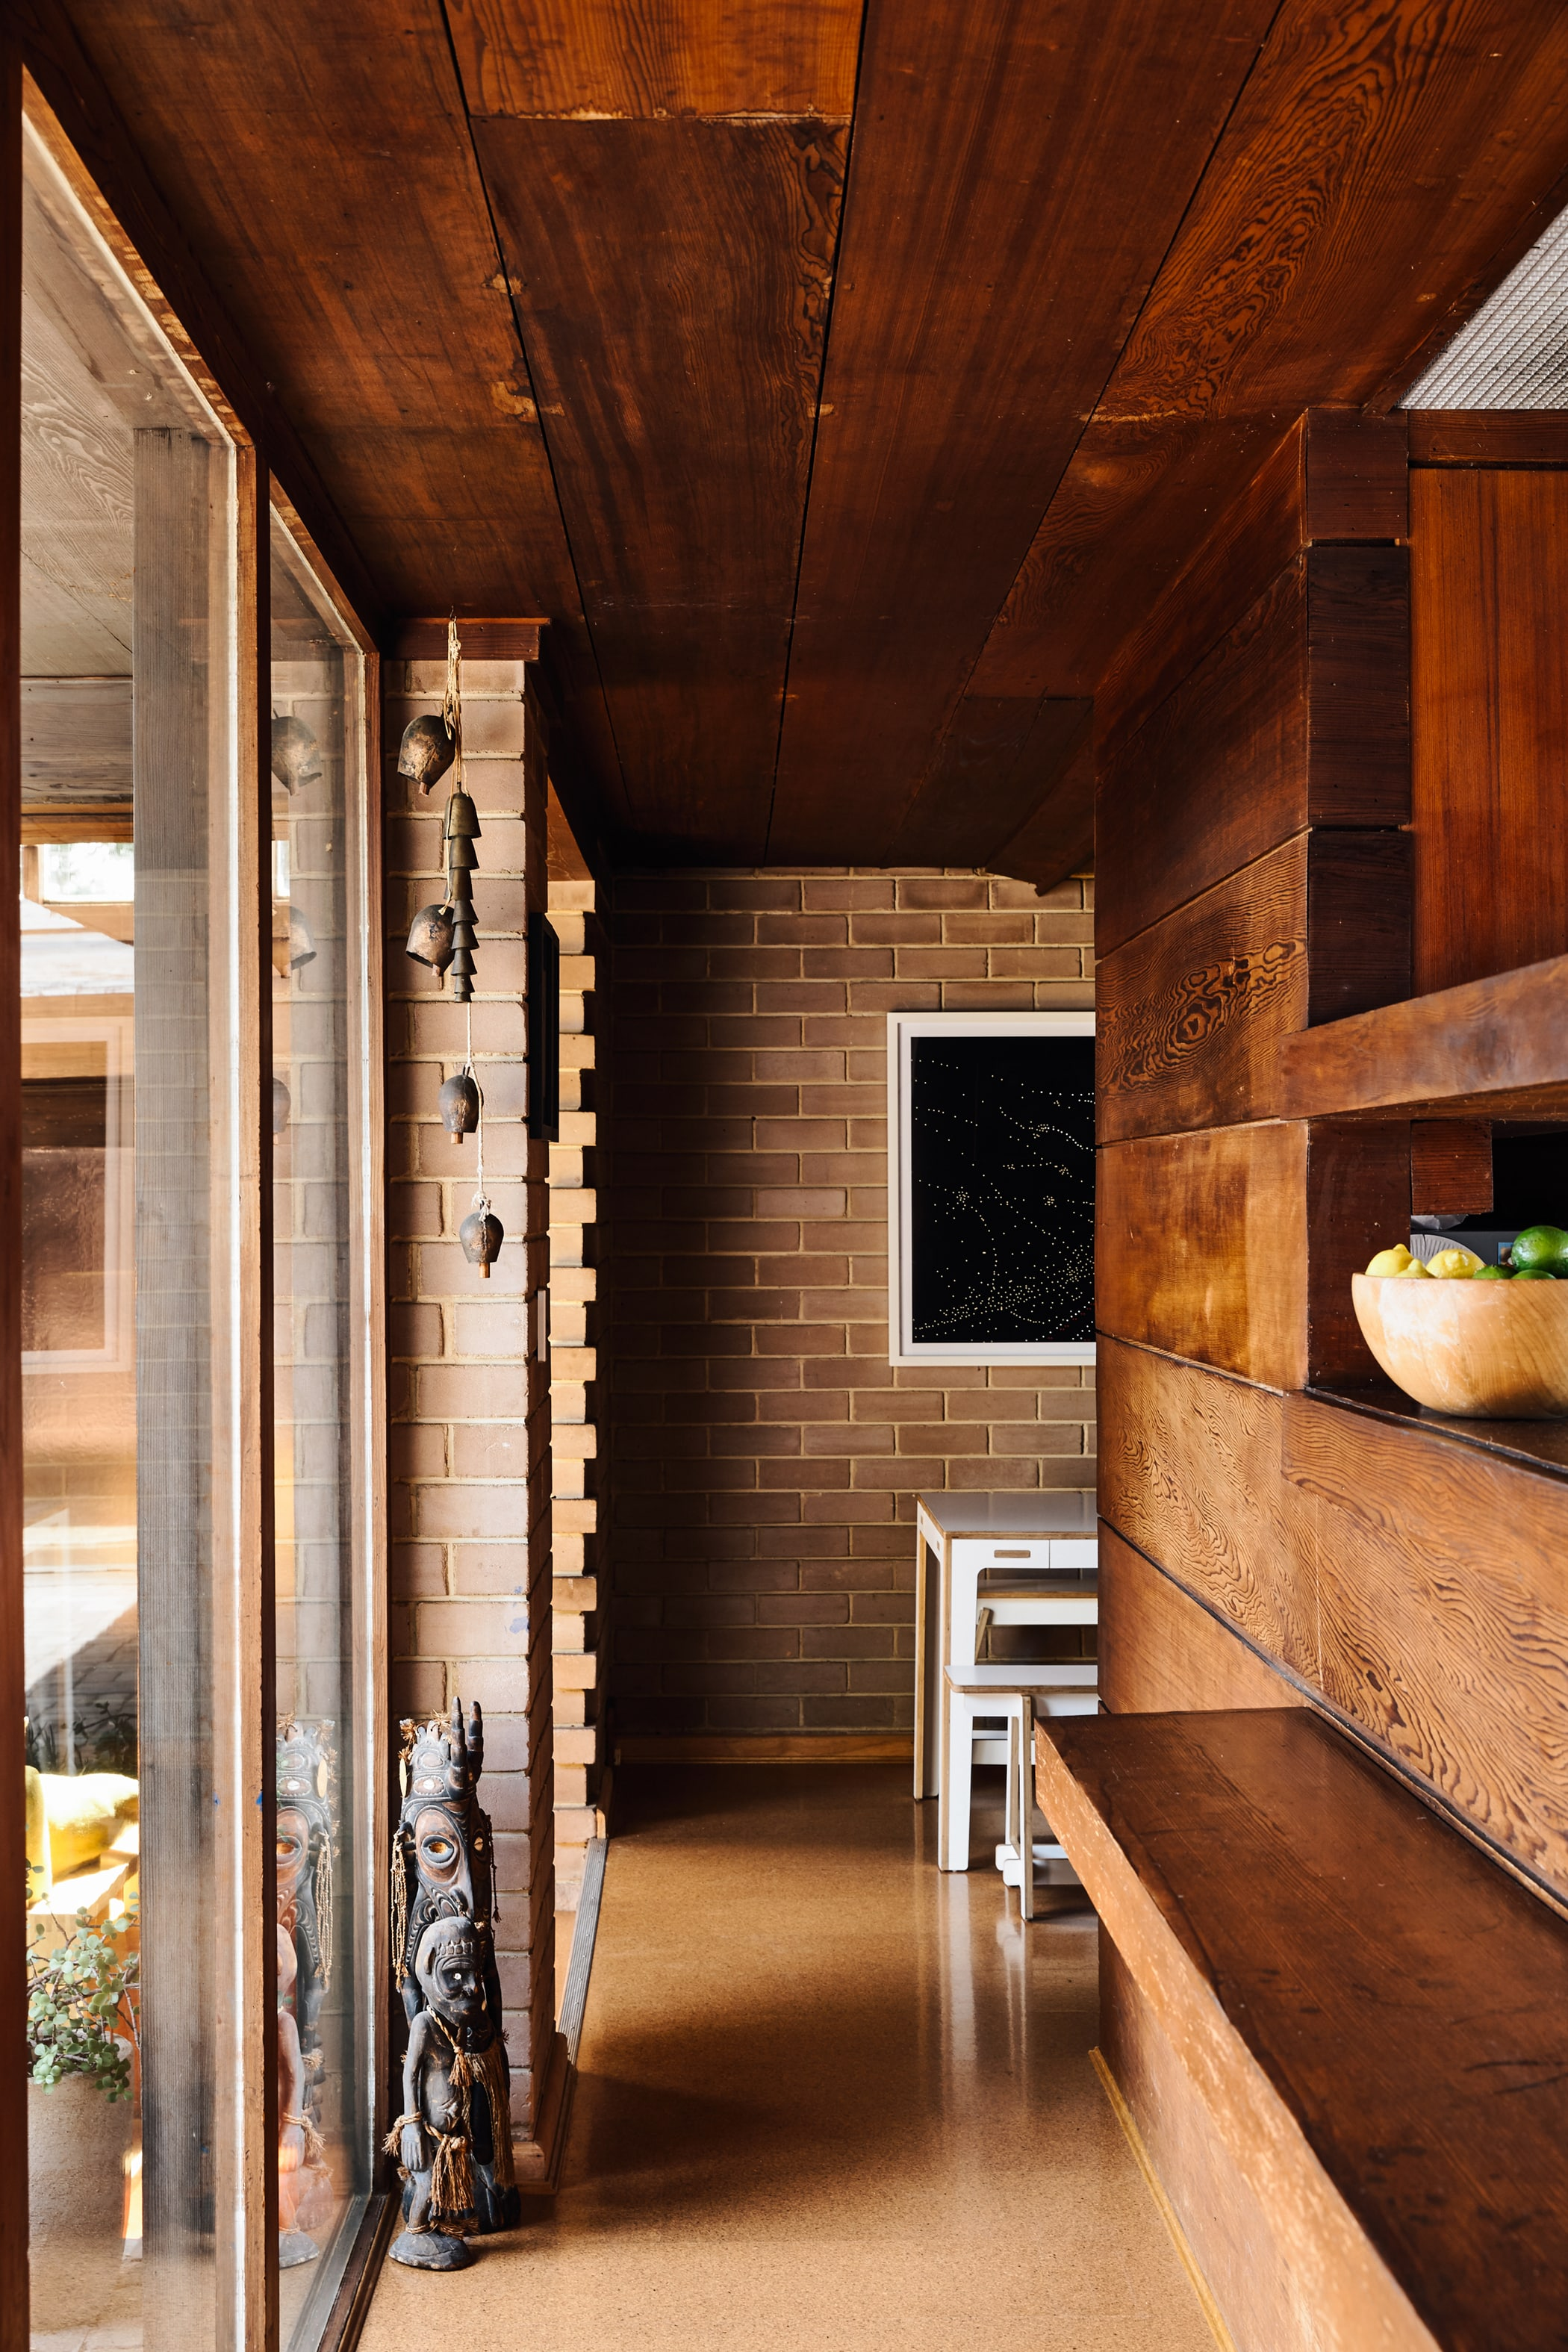 Gallery Of The Godsell House By David Godsell Local Australian Mid Century Modern Architecture Beaumaris, Vic Image 7